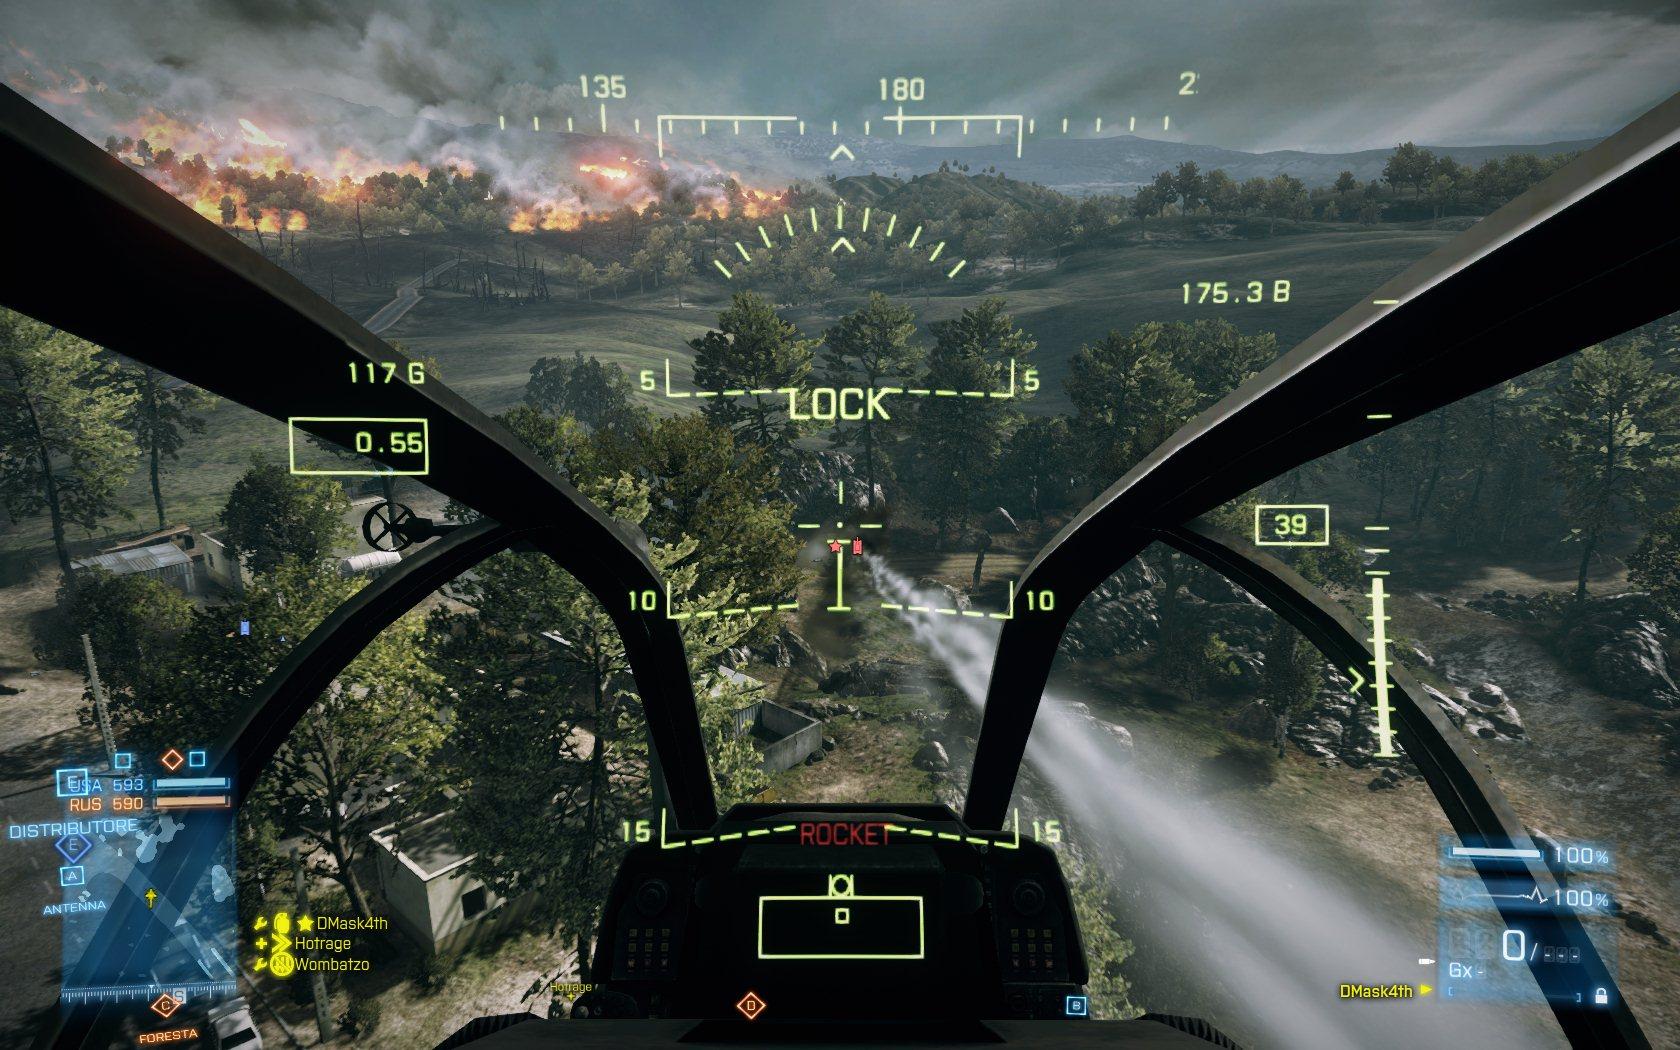 Elicottero Interno : File eh interno g wikimedia commons